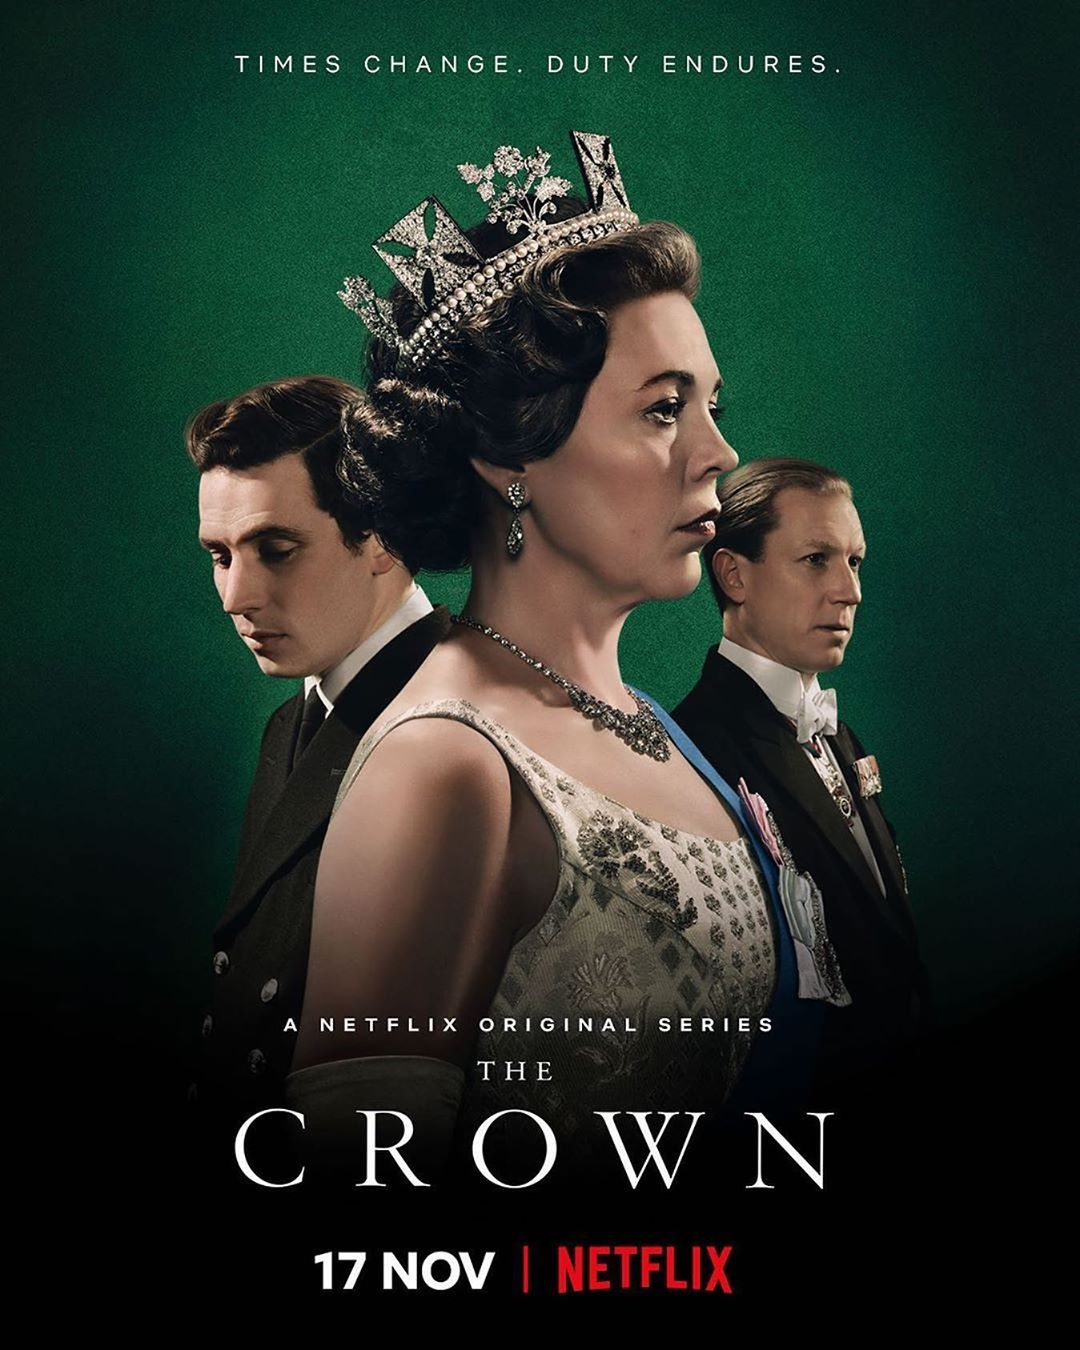 The Crown sezon 3